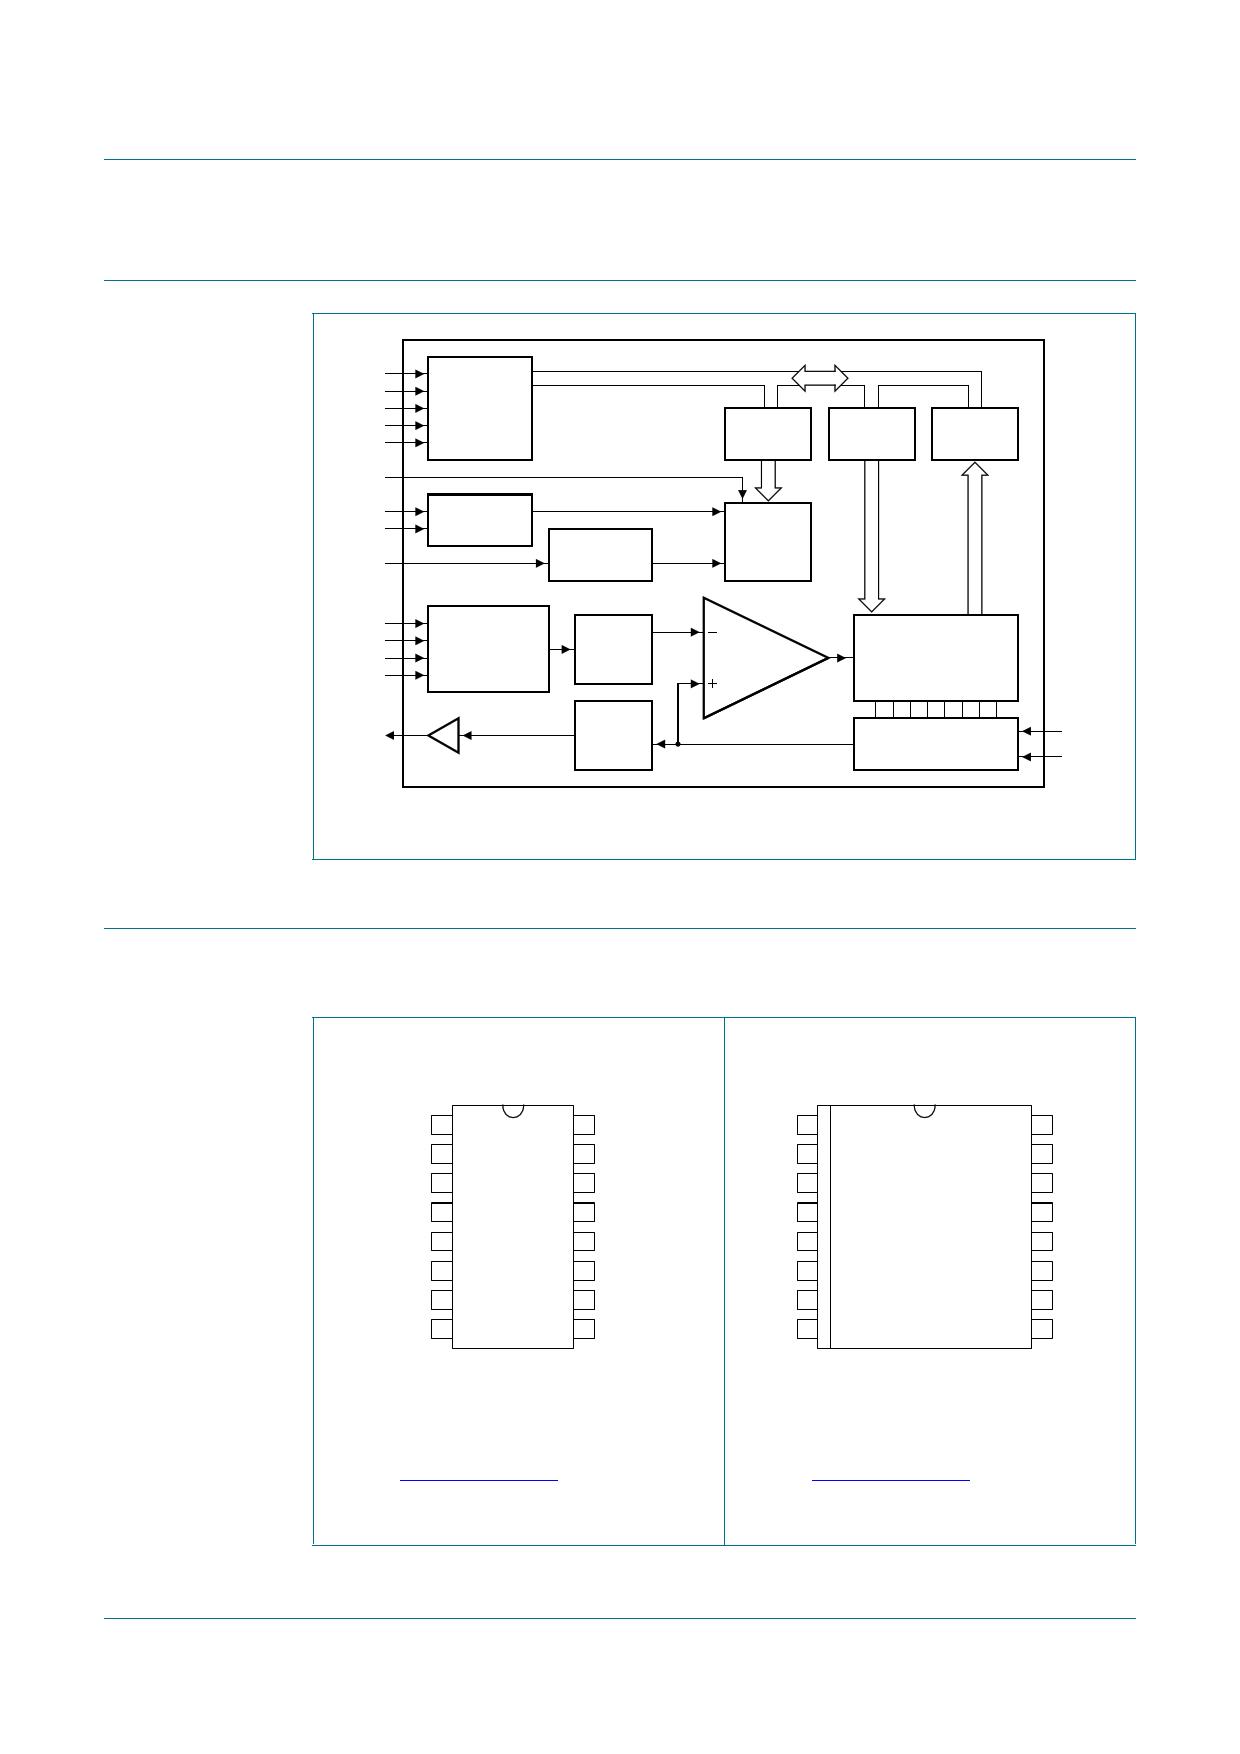 pcf8591  u30c7 u30fc u30bf u30b7 u30fc u30c8 pdf  d and d  a converter